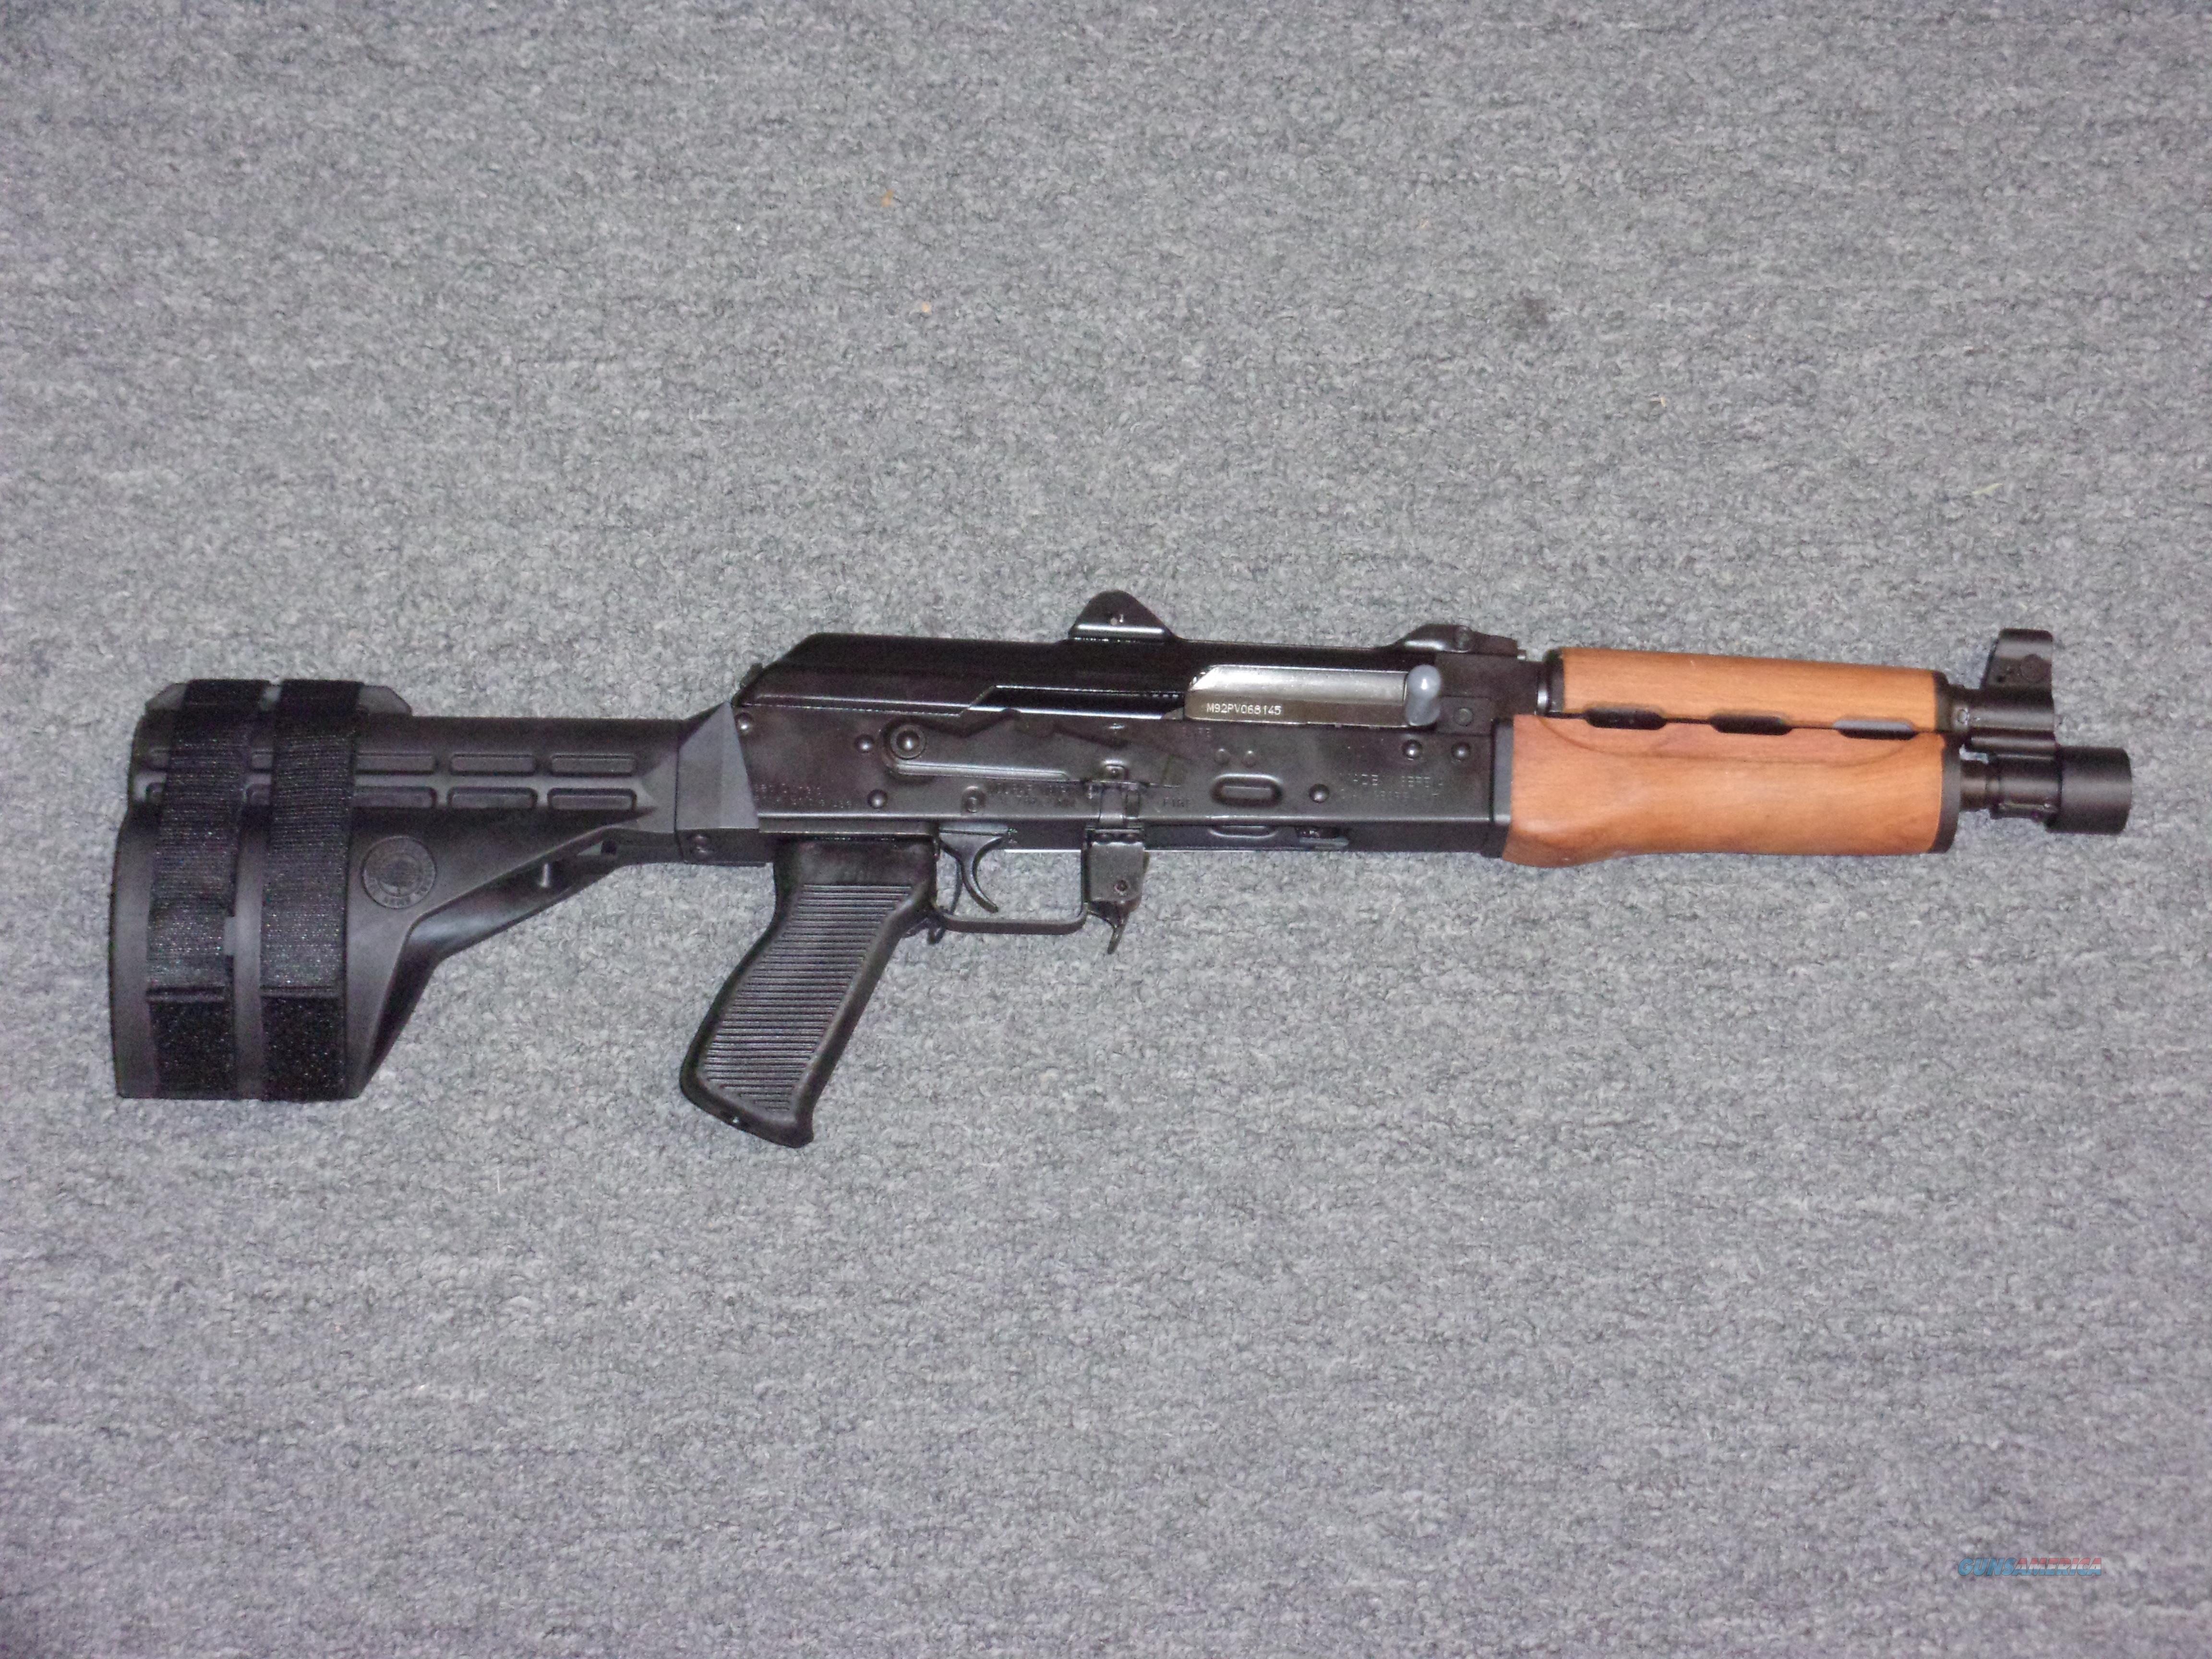 Century Arms / Zastava PAP M92PV 7.62x39 for sale